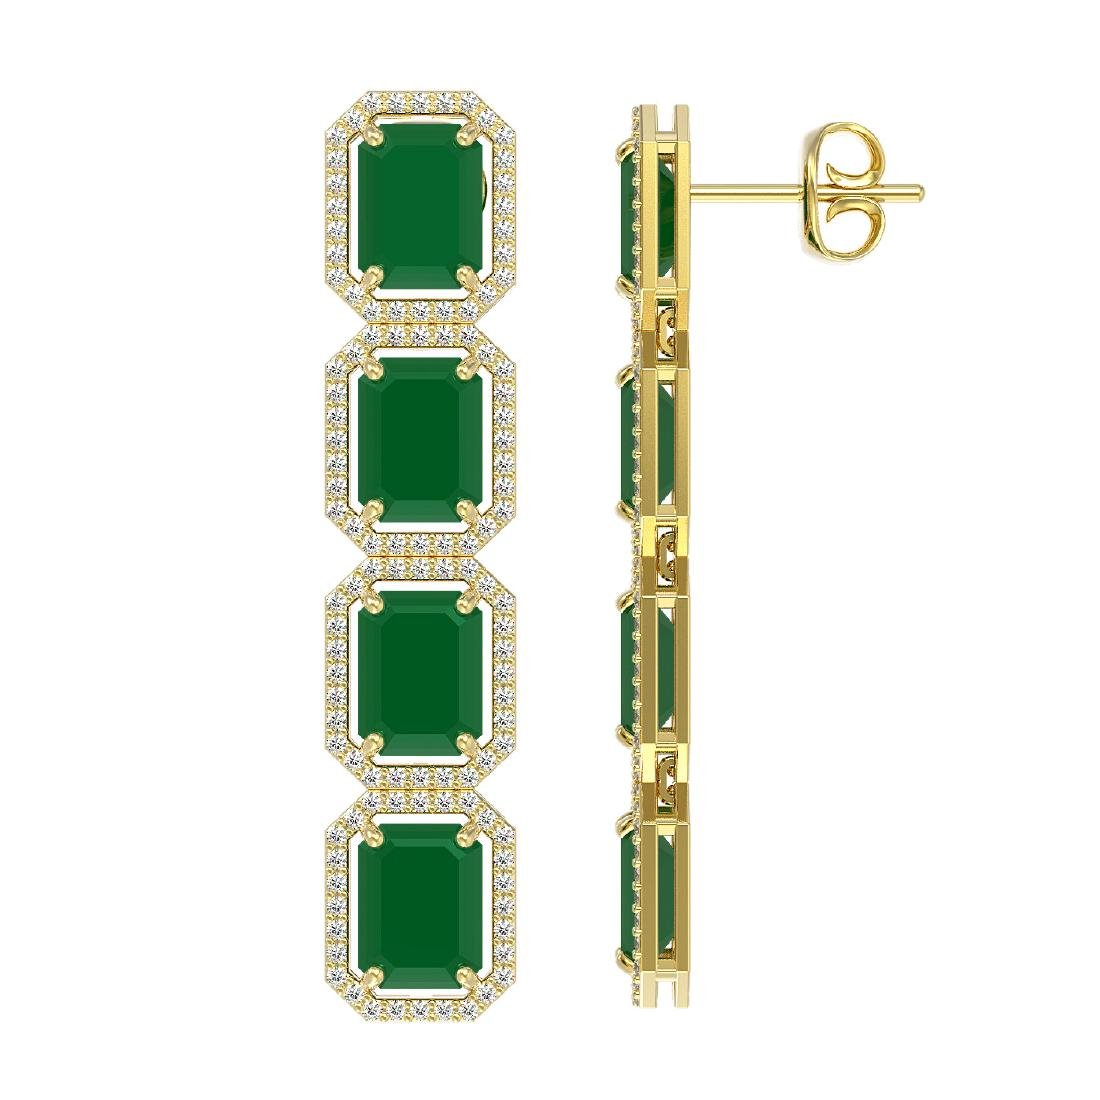 20.59 CTW Emerald & Diamond Halo Earrings 10K Yellow - 2